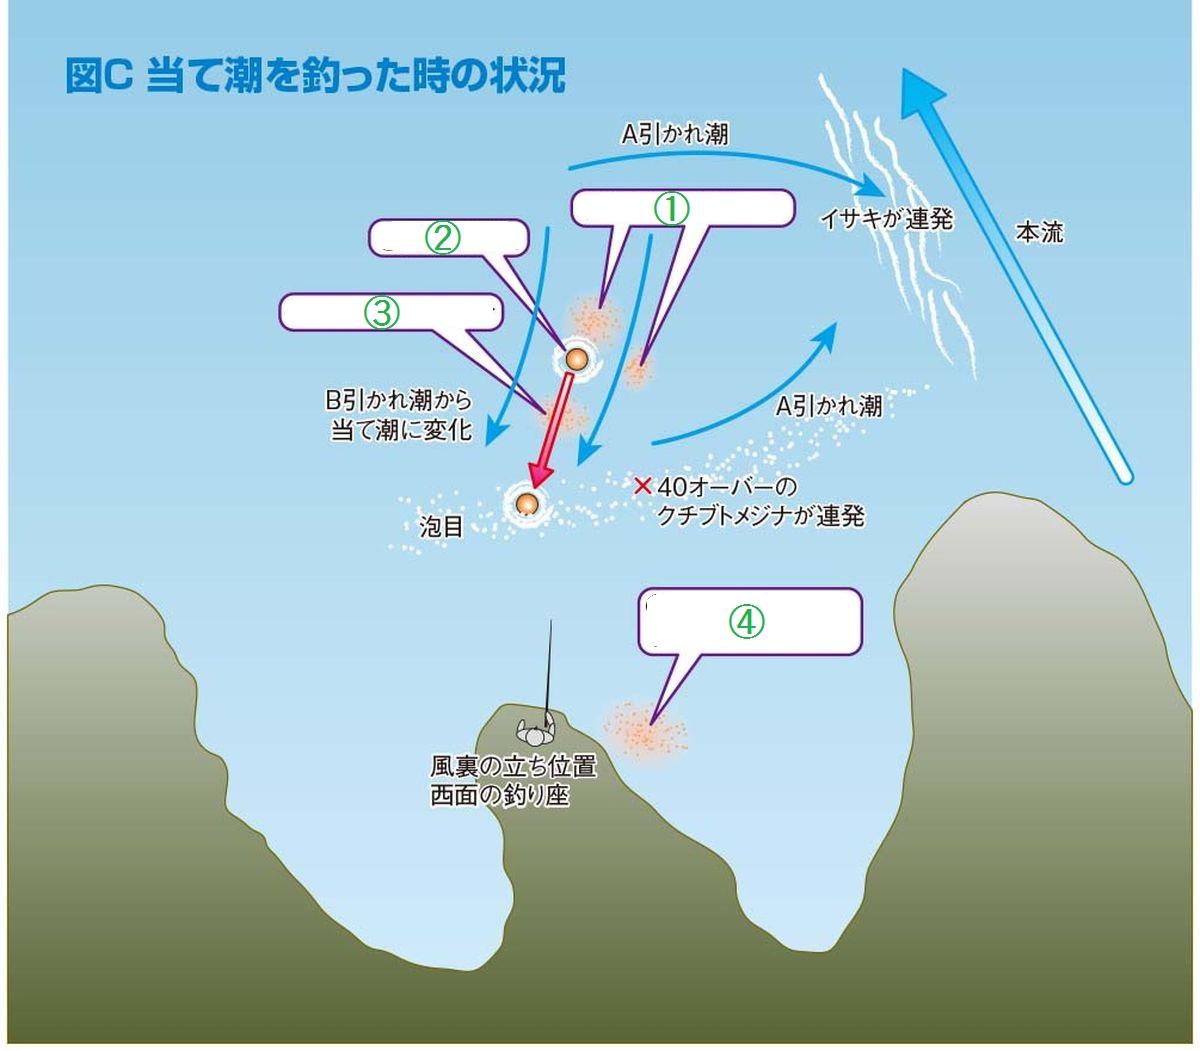 088-091tanaka-highteku_cs6 (20)